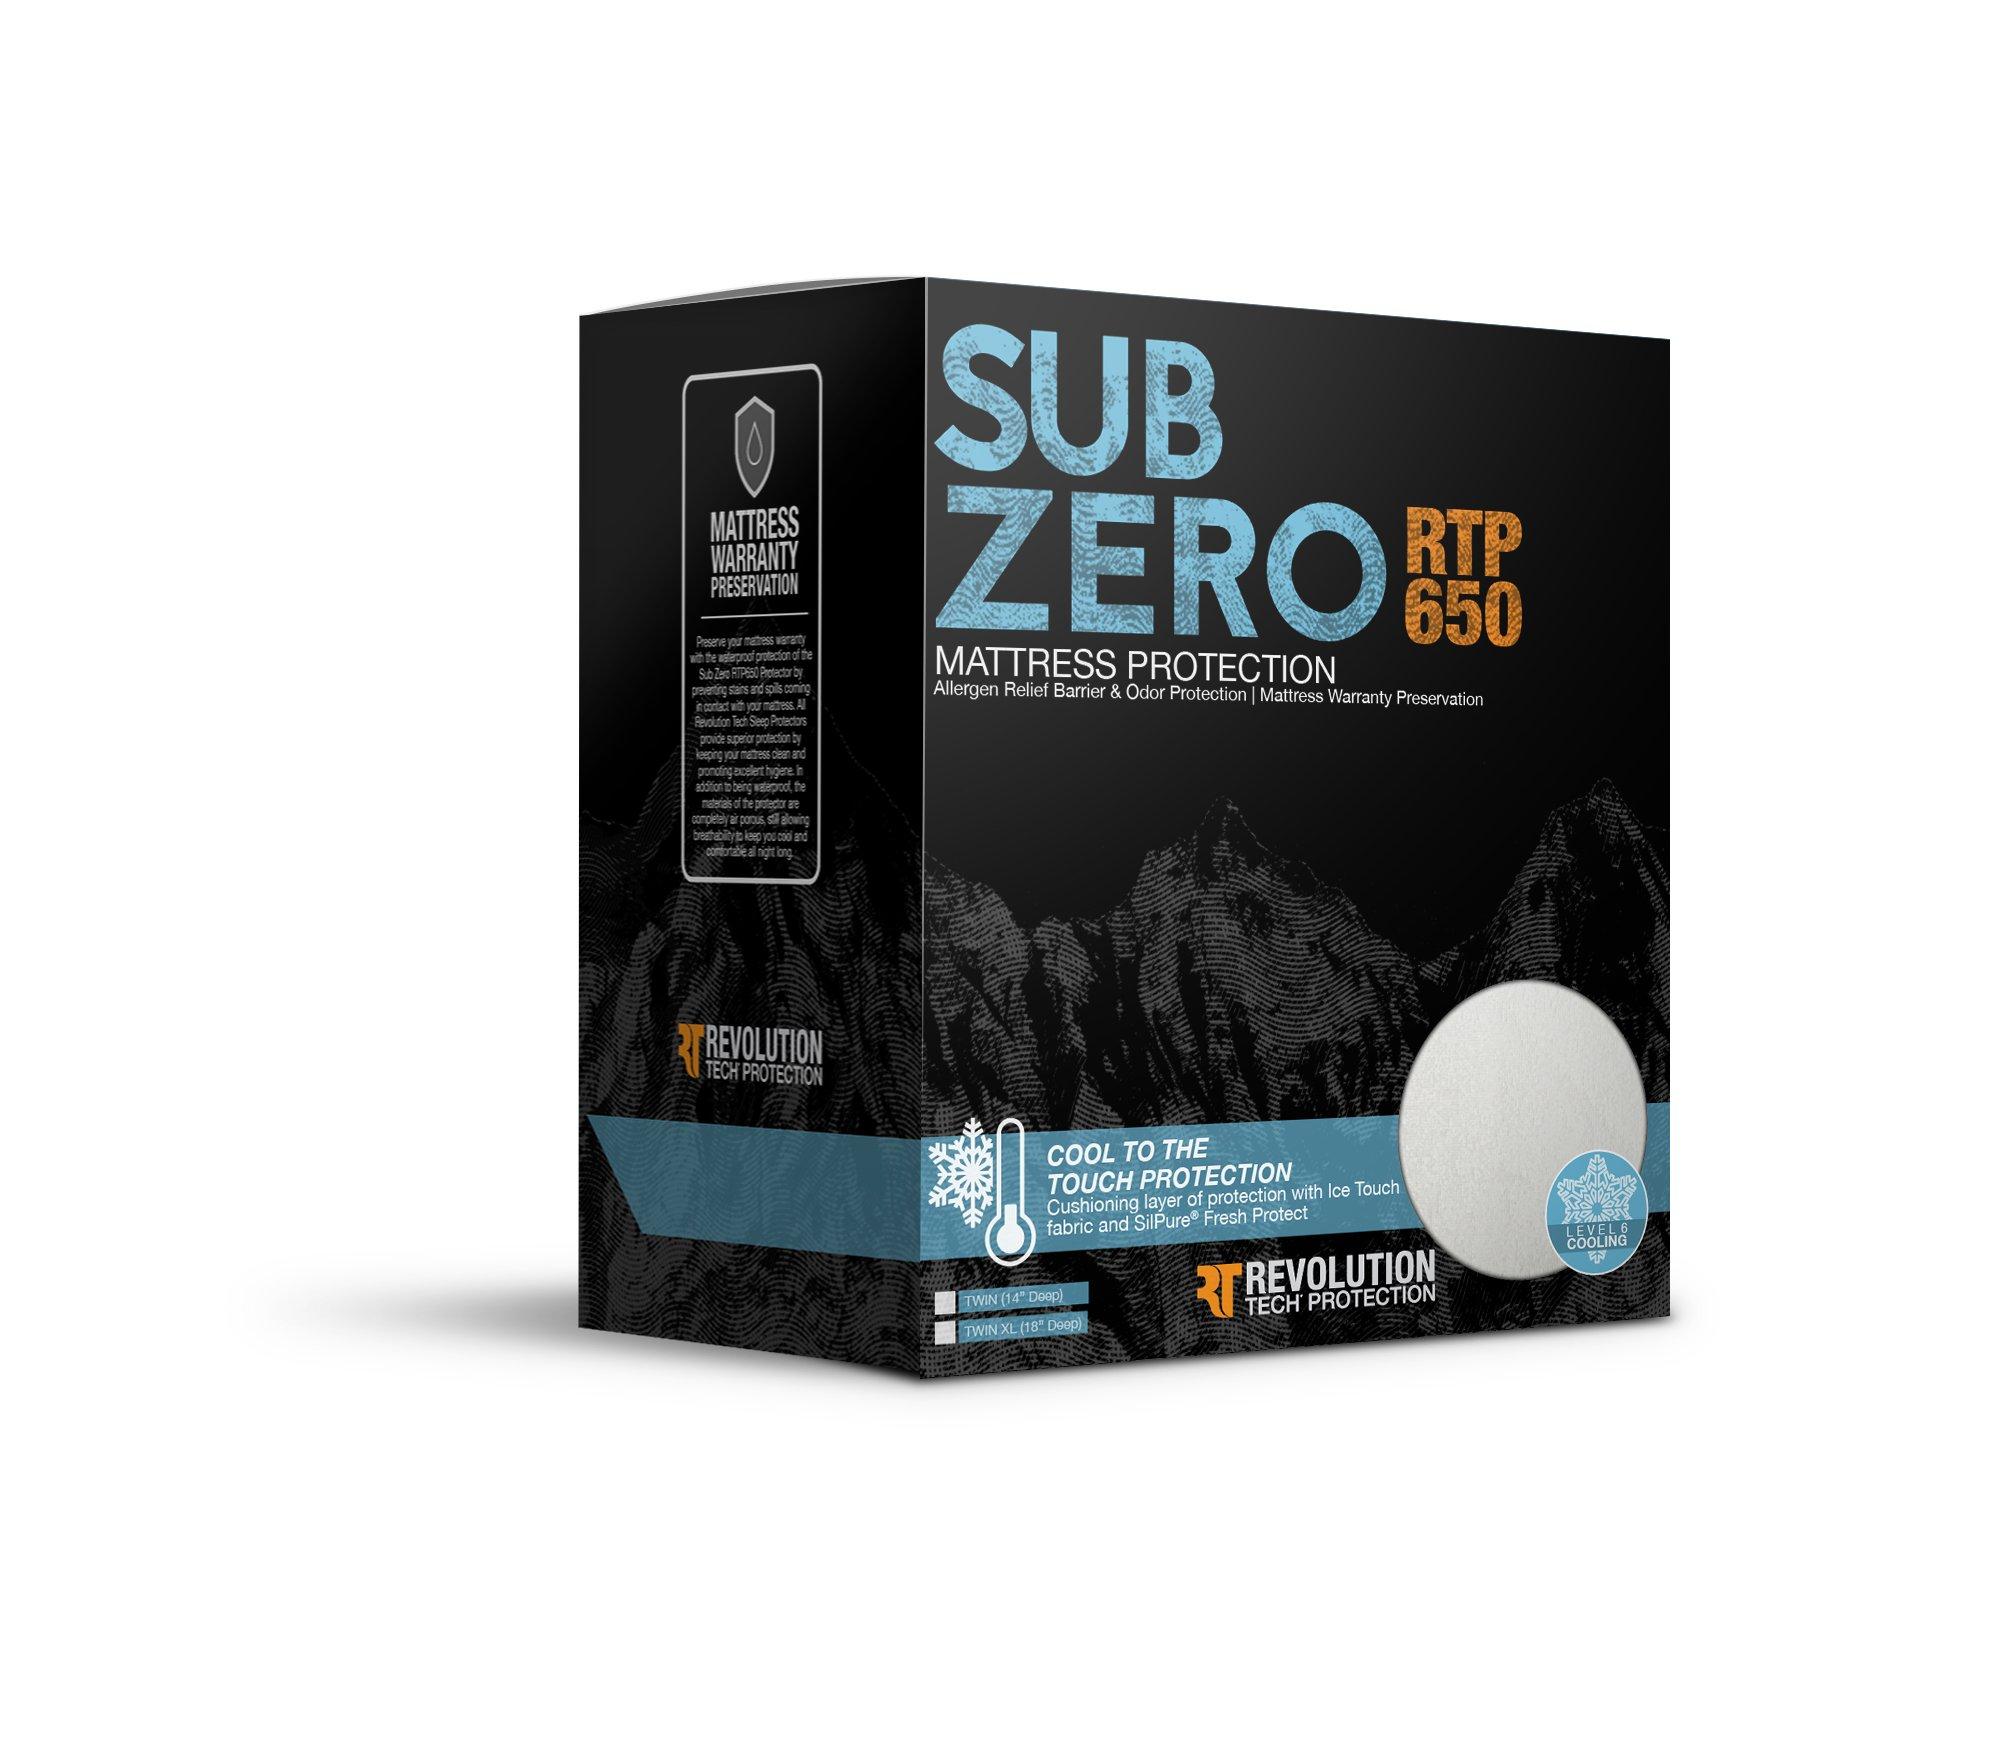 Glideaway Sub Zero Temperature Regulating Premium Hypoallergenic Waterproof Mattress Protector - Twin XL Size